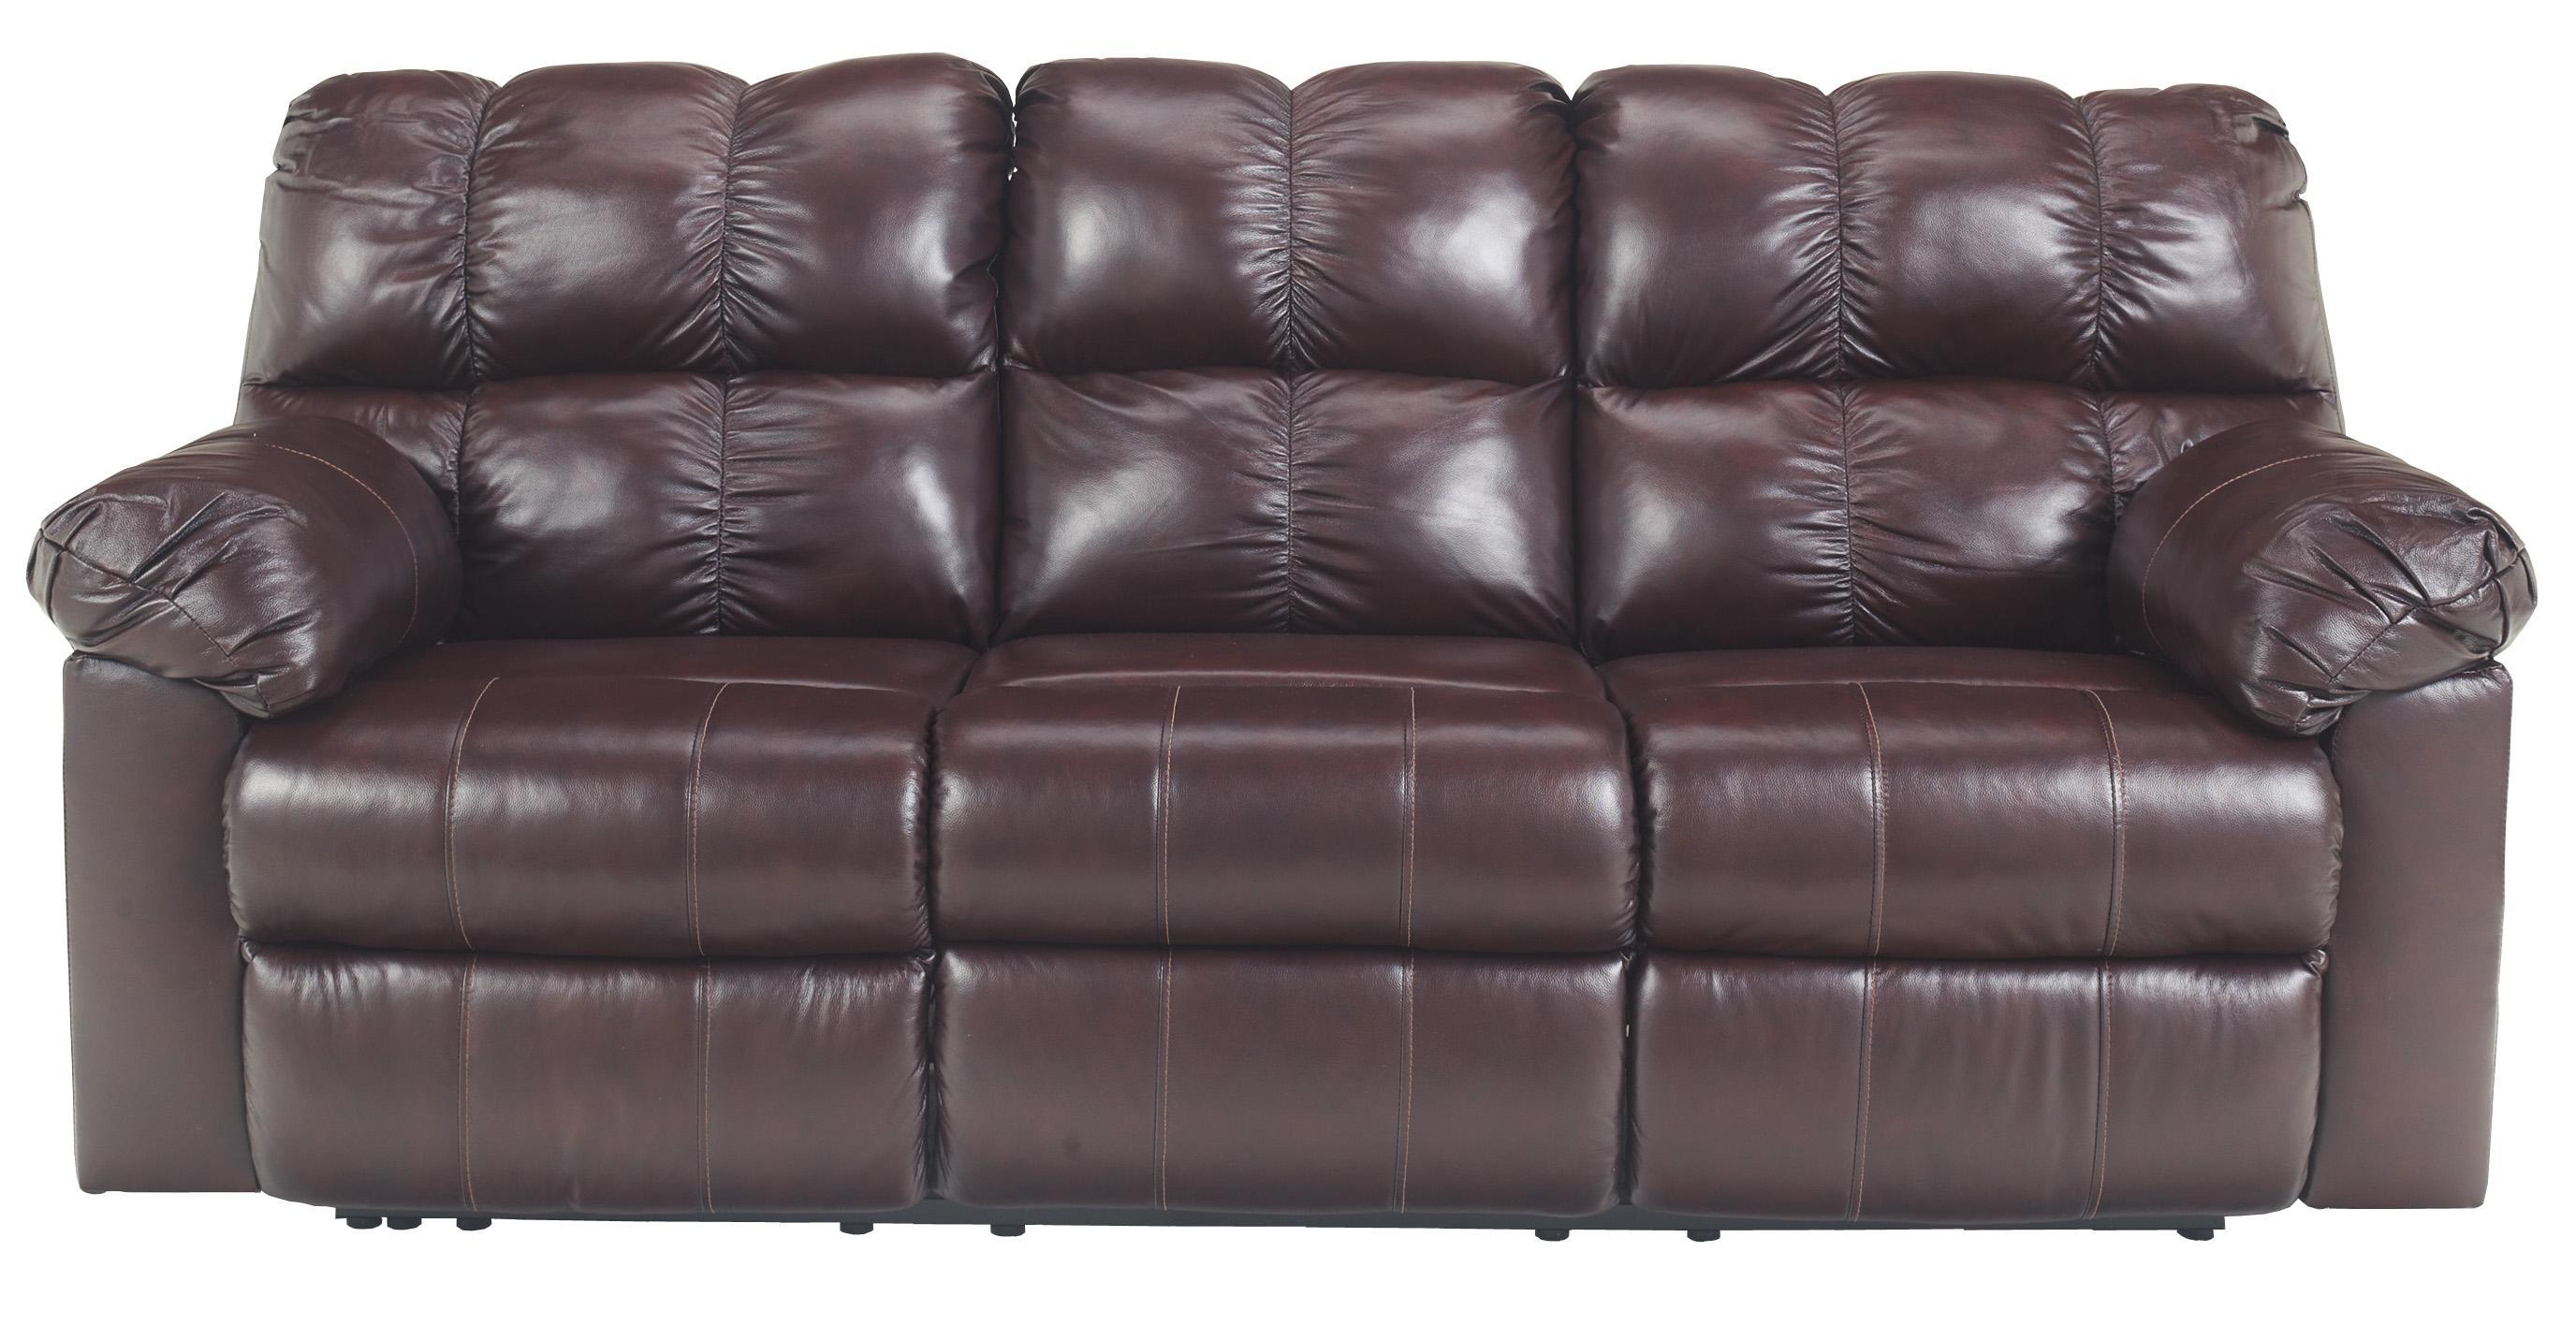 Signature Design by Ashley Kennard - Burgundy Reclining Sofa - Item Number: 2900088